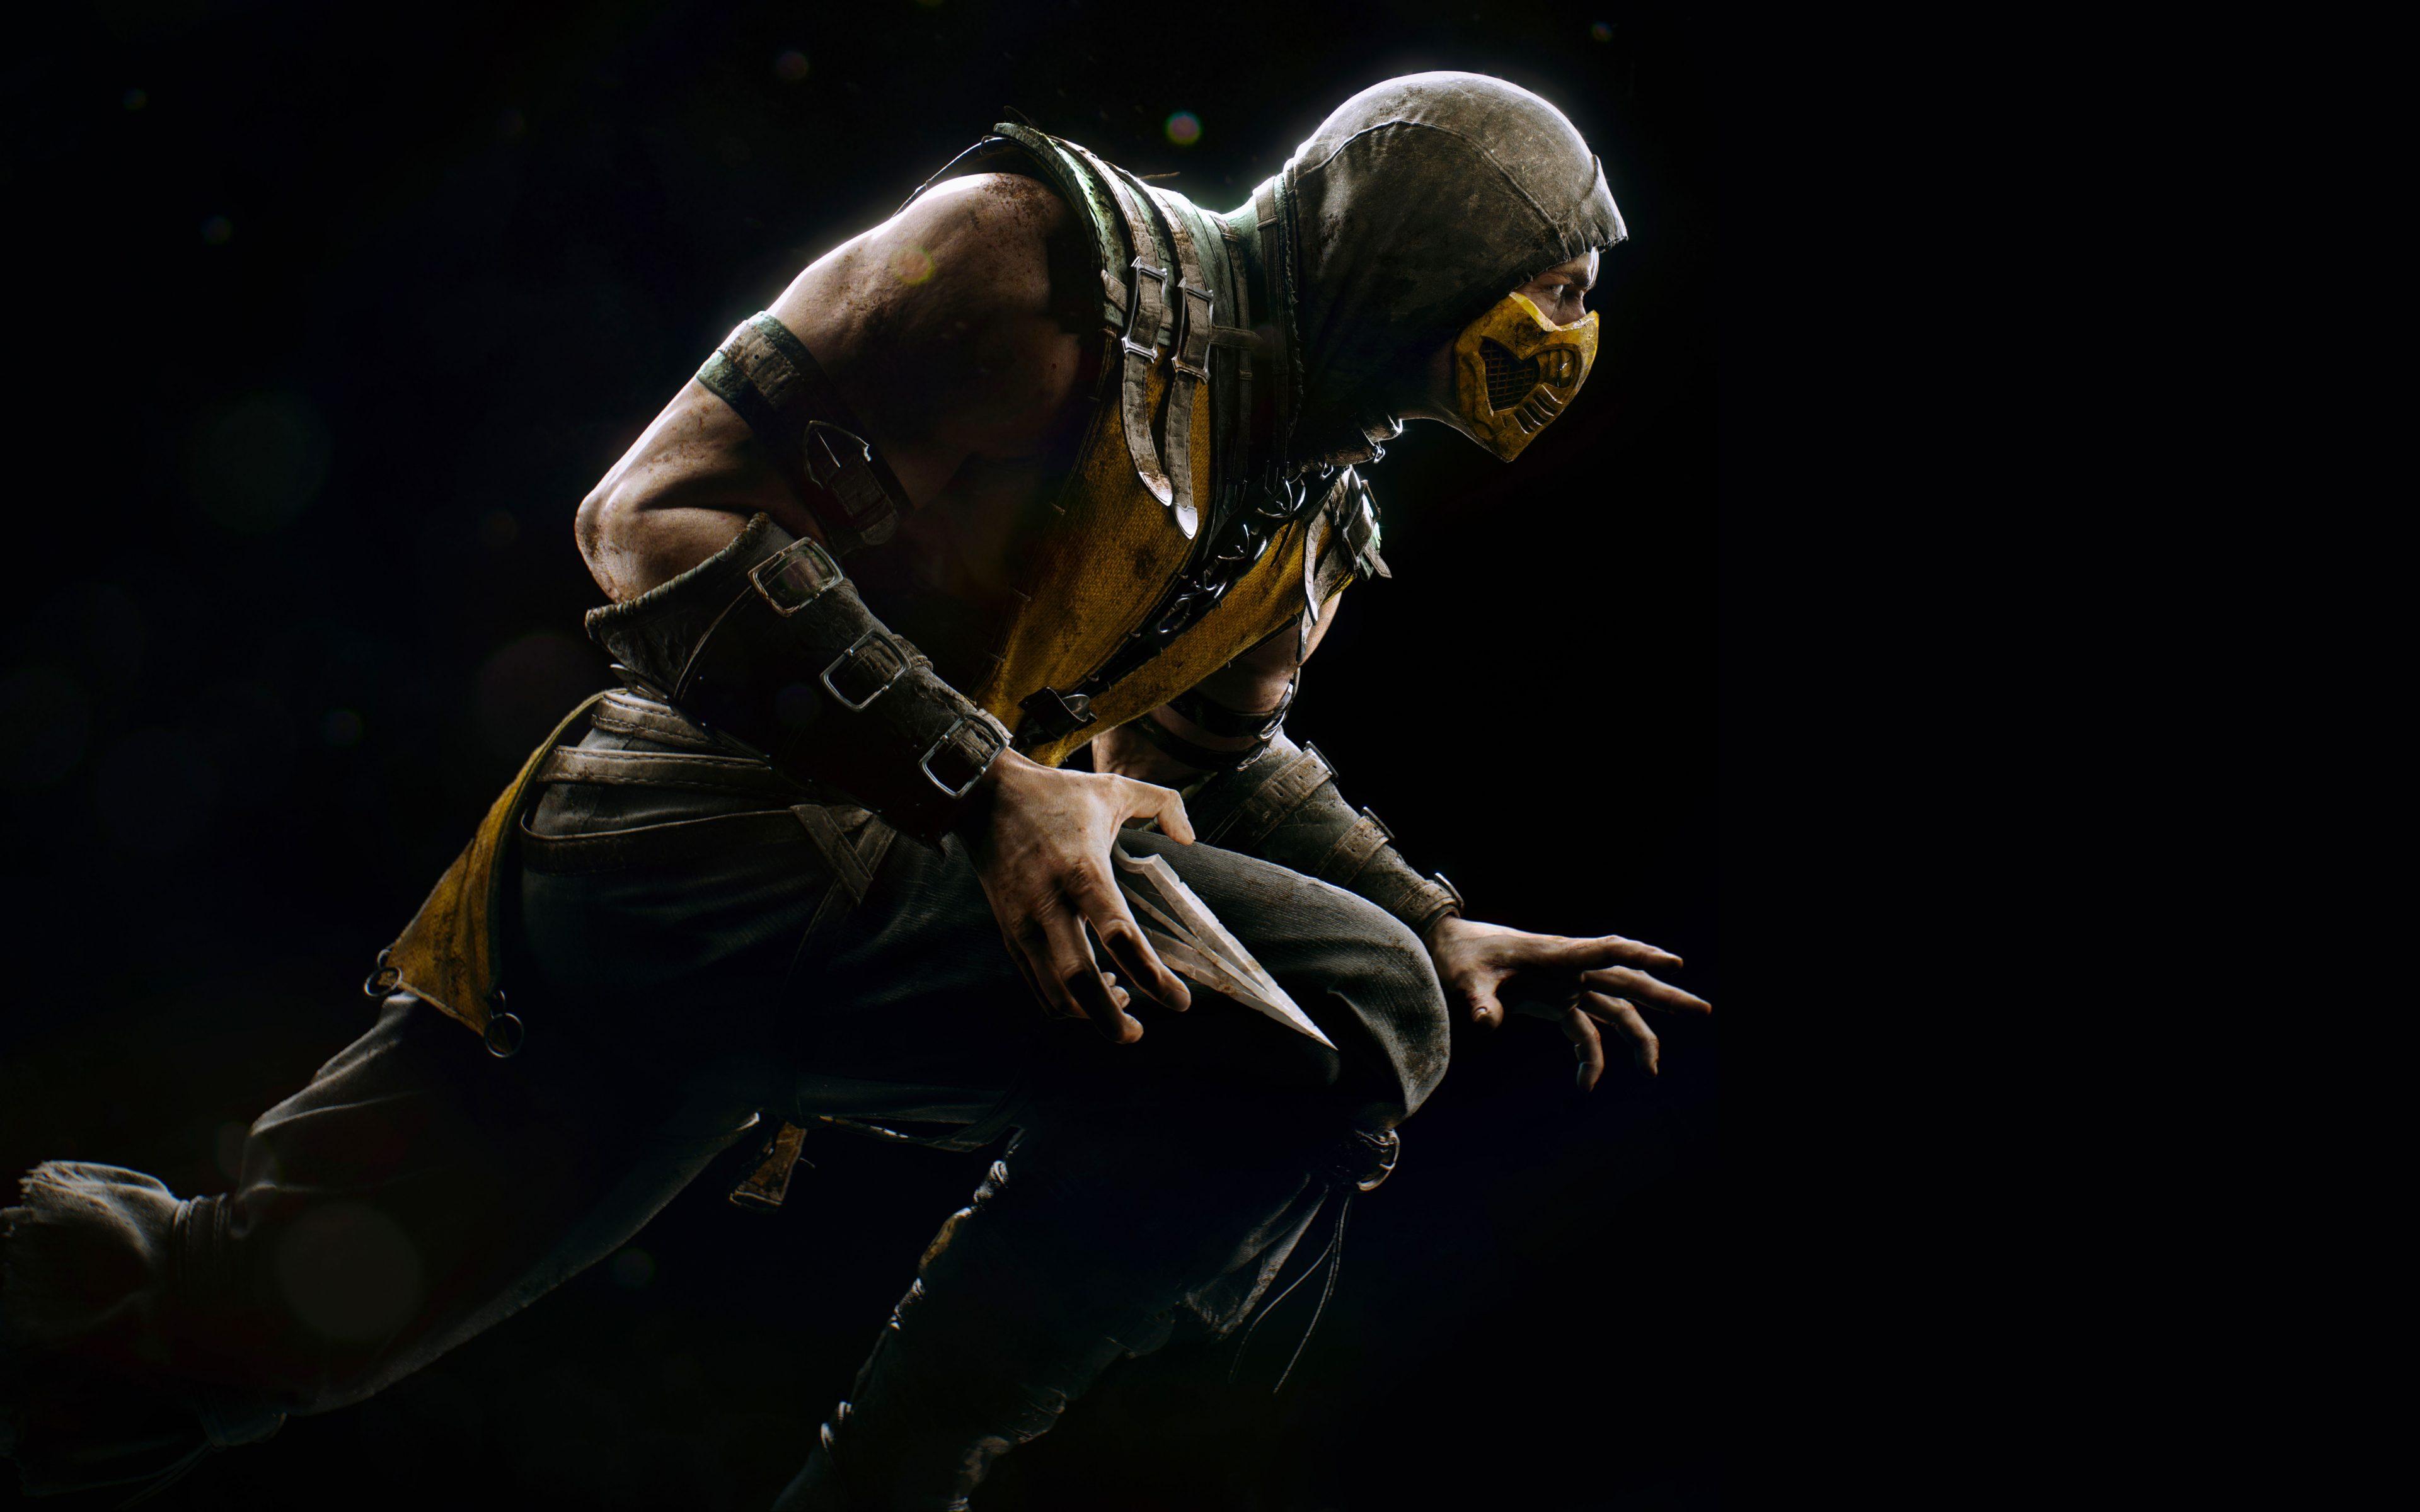 4k Ultra Hd Mortal Kombat X Wallpaper 4k 79599 Hd Wallpaper